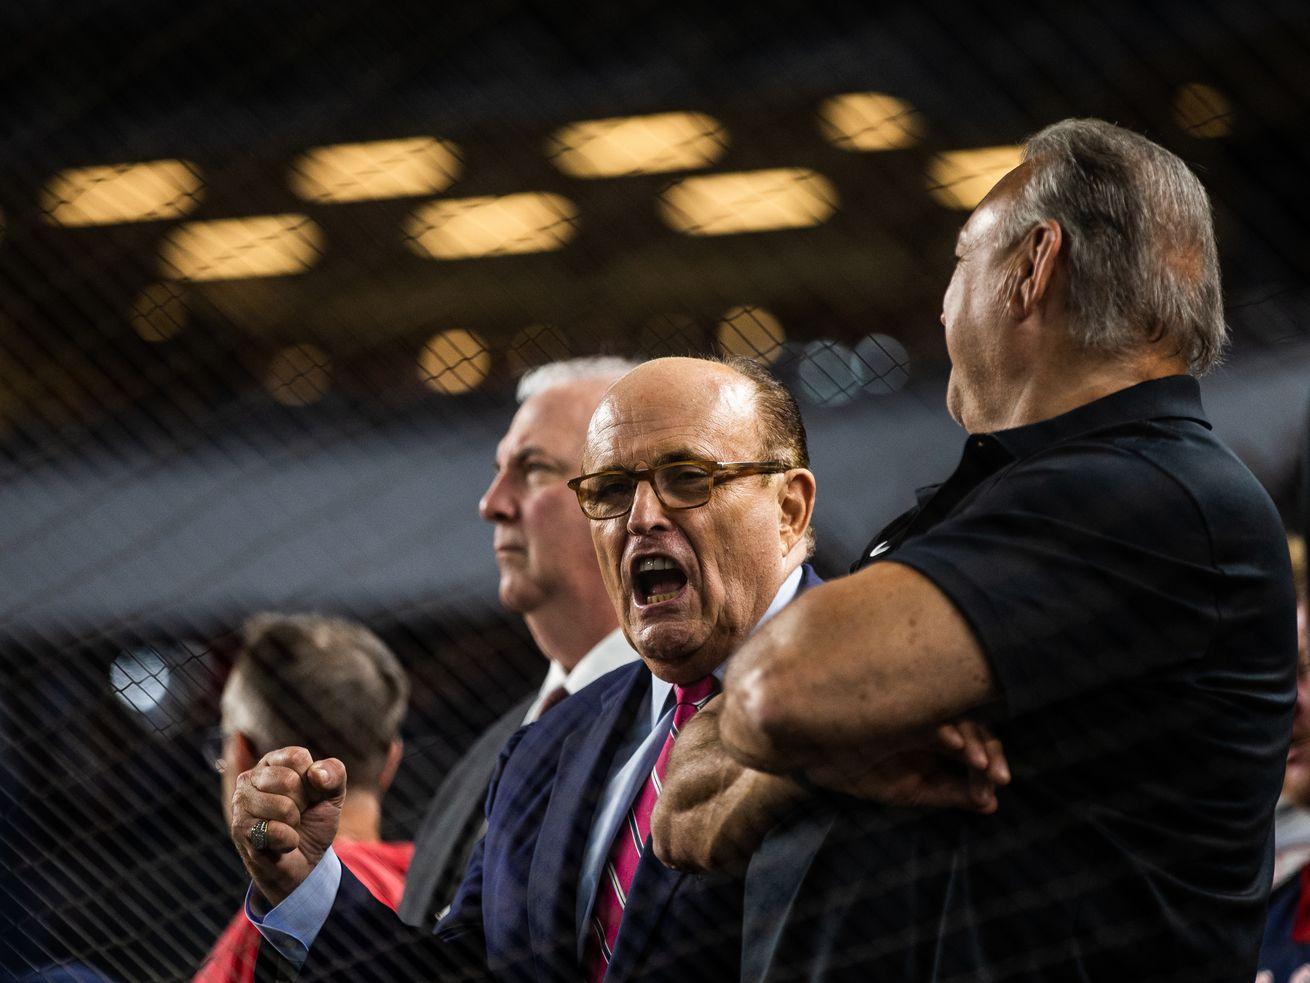 As Impeachment Looms Rudy Giuliani S Ukraine Conspiracies Are Getting More Outlandish Pnu